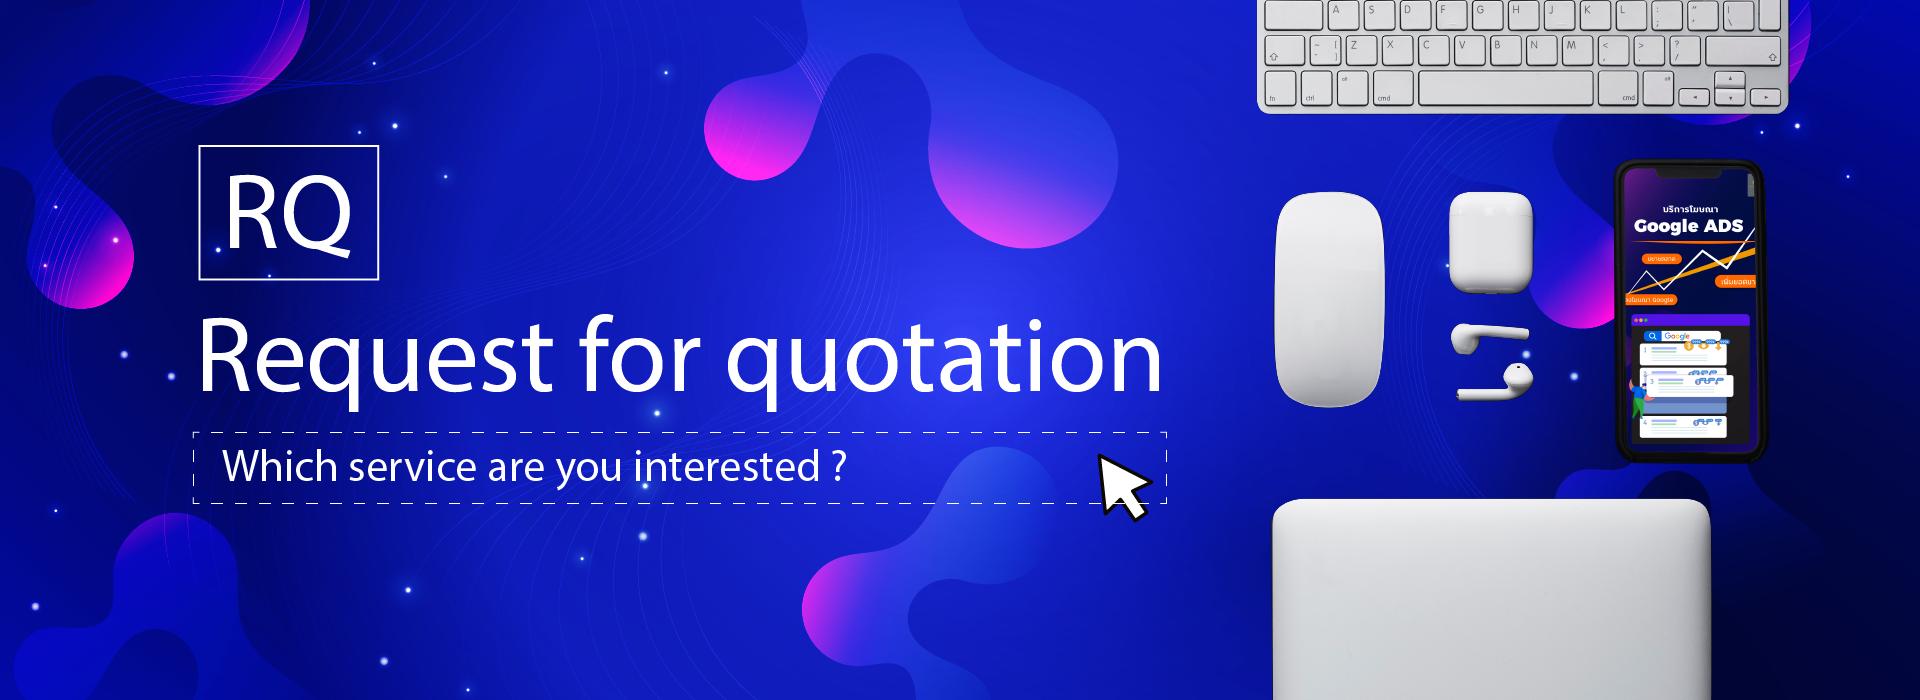 fb-banner-qoutation2-01